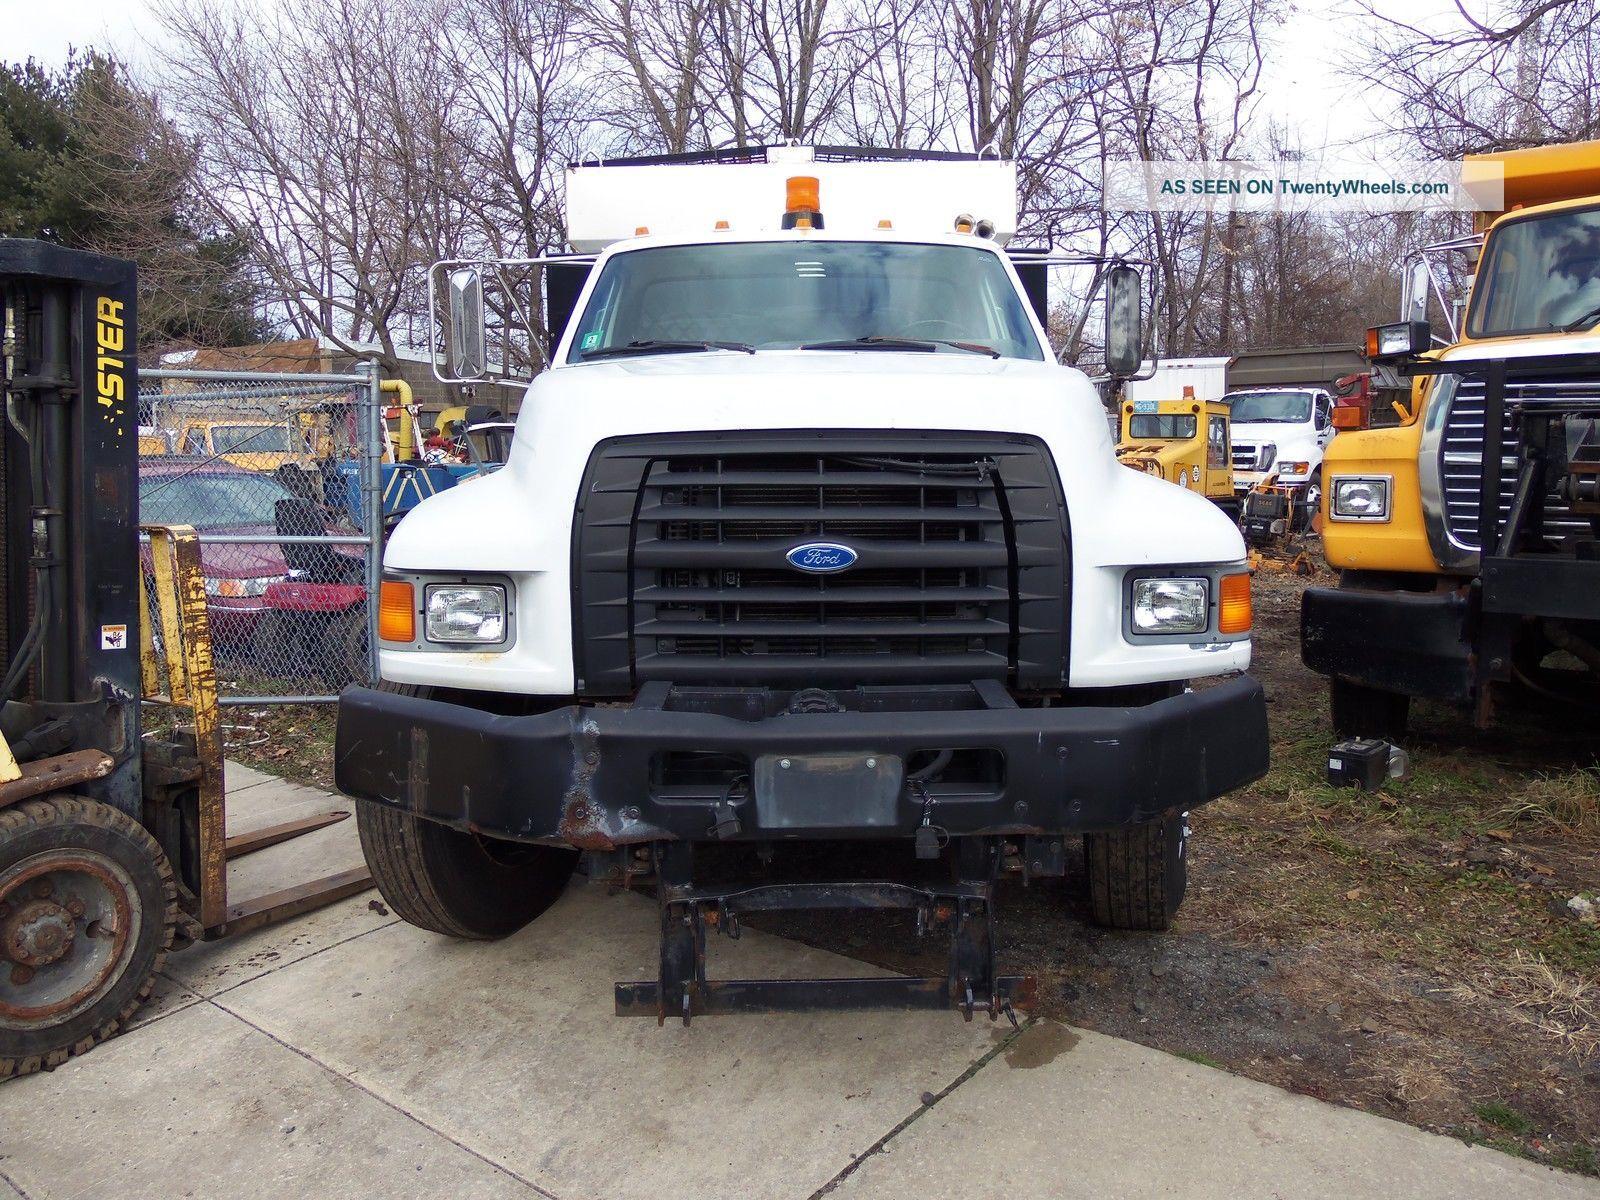 1997 Ford F800 Other Heavy Duty Trucks photo